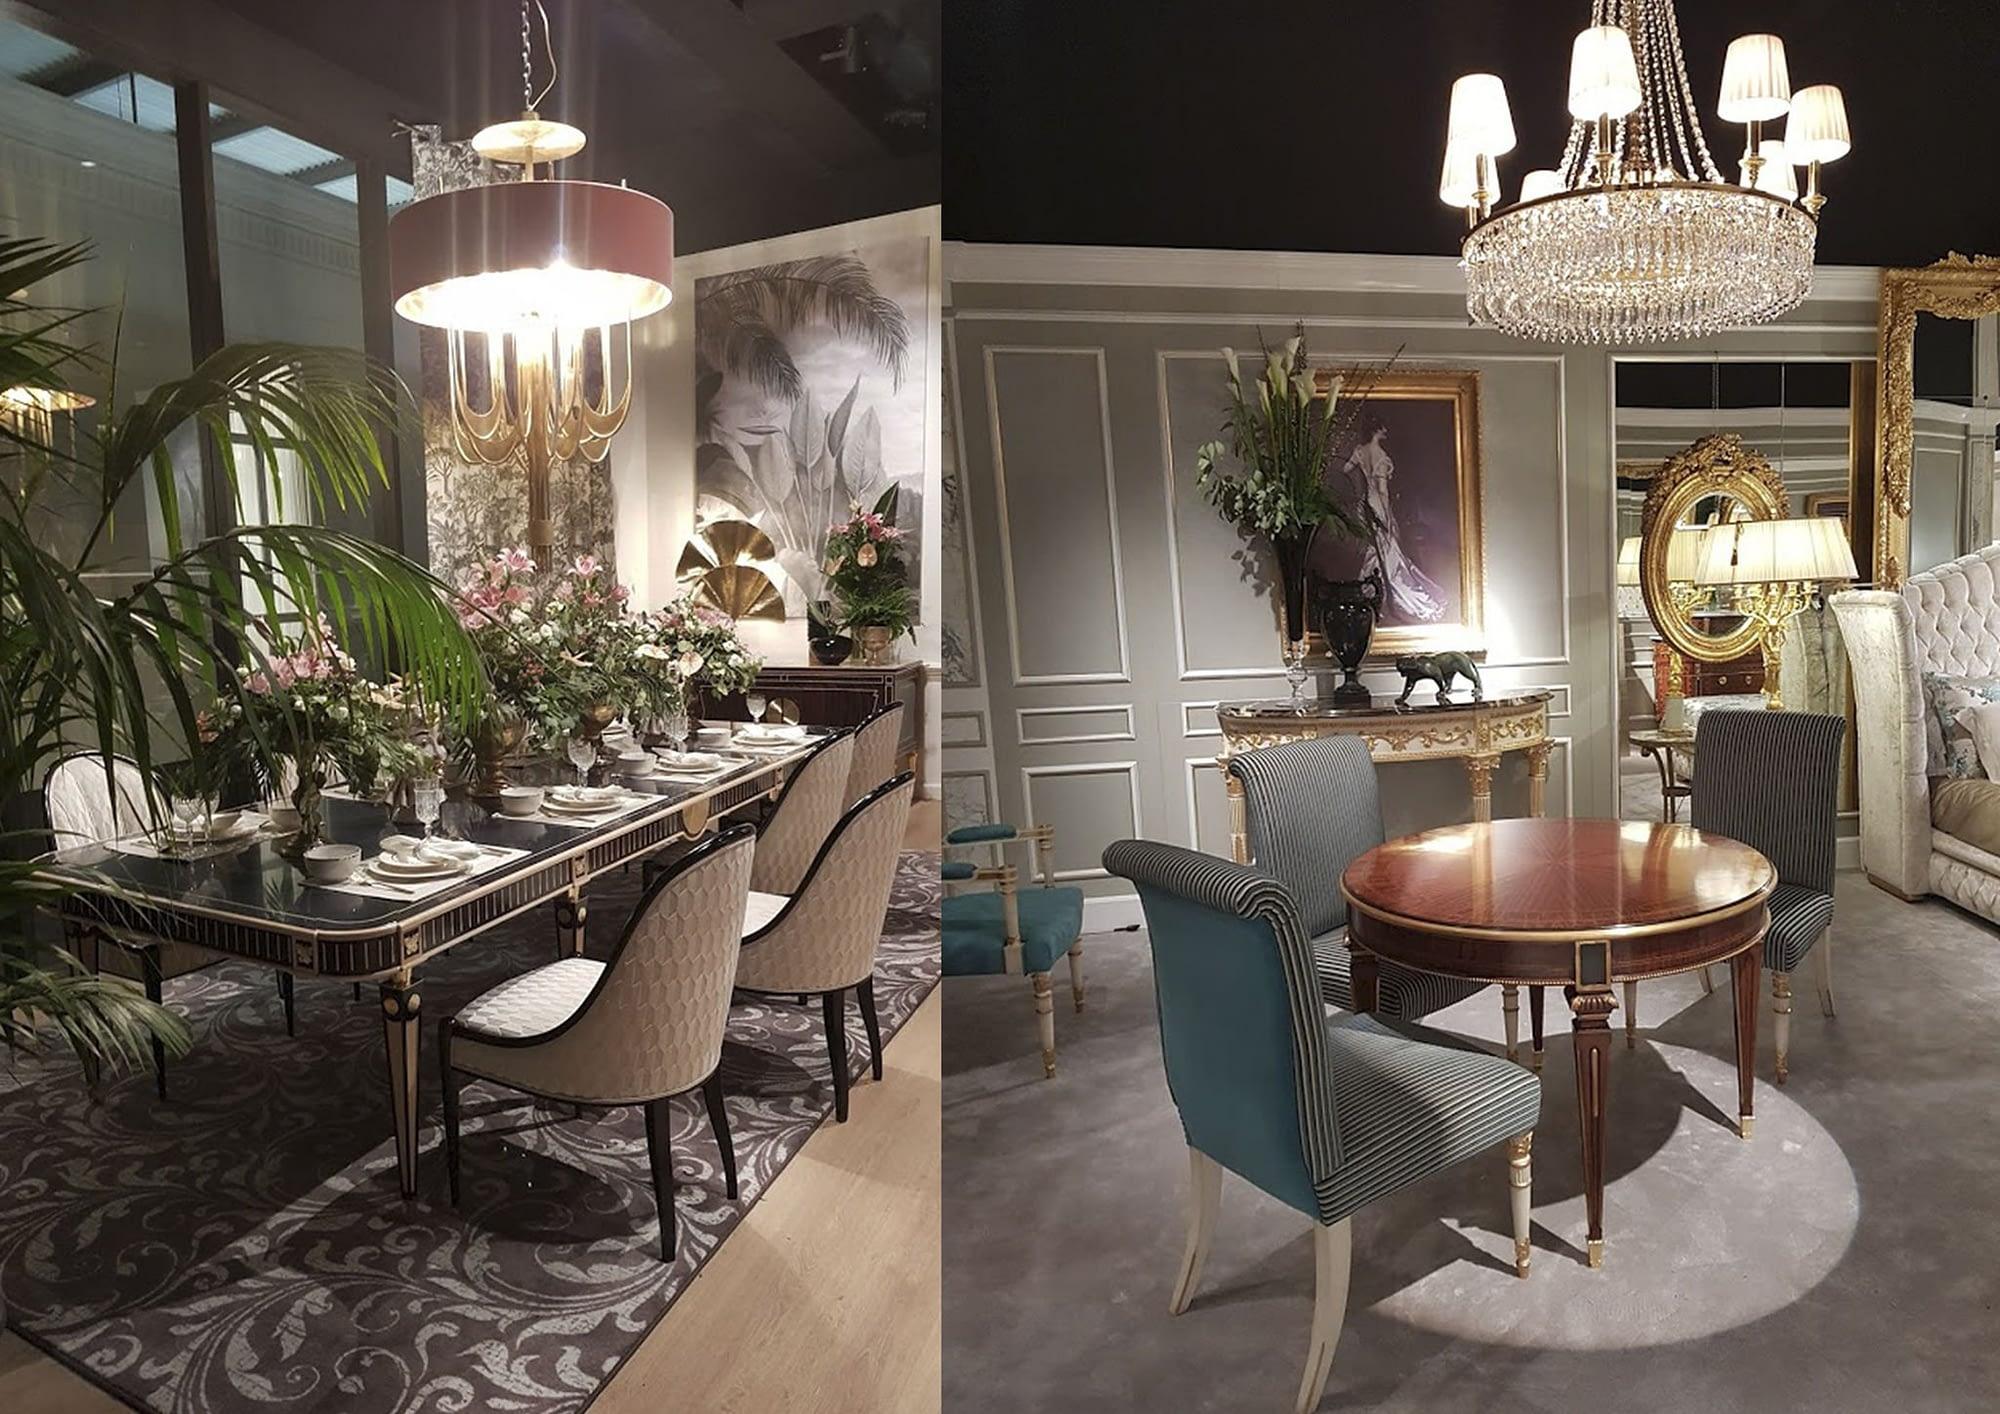 Milano Design Week 2018 - Salone del Mobile 85